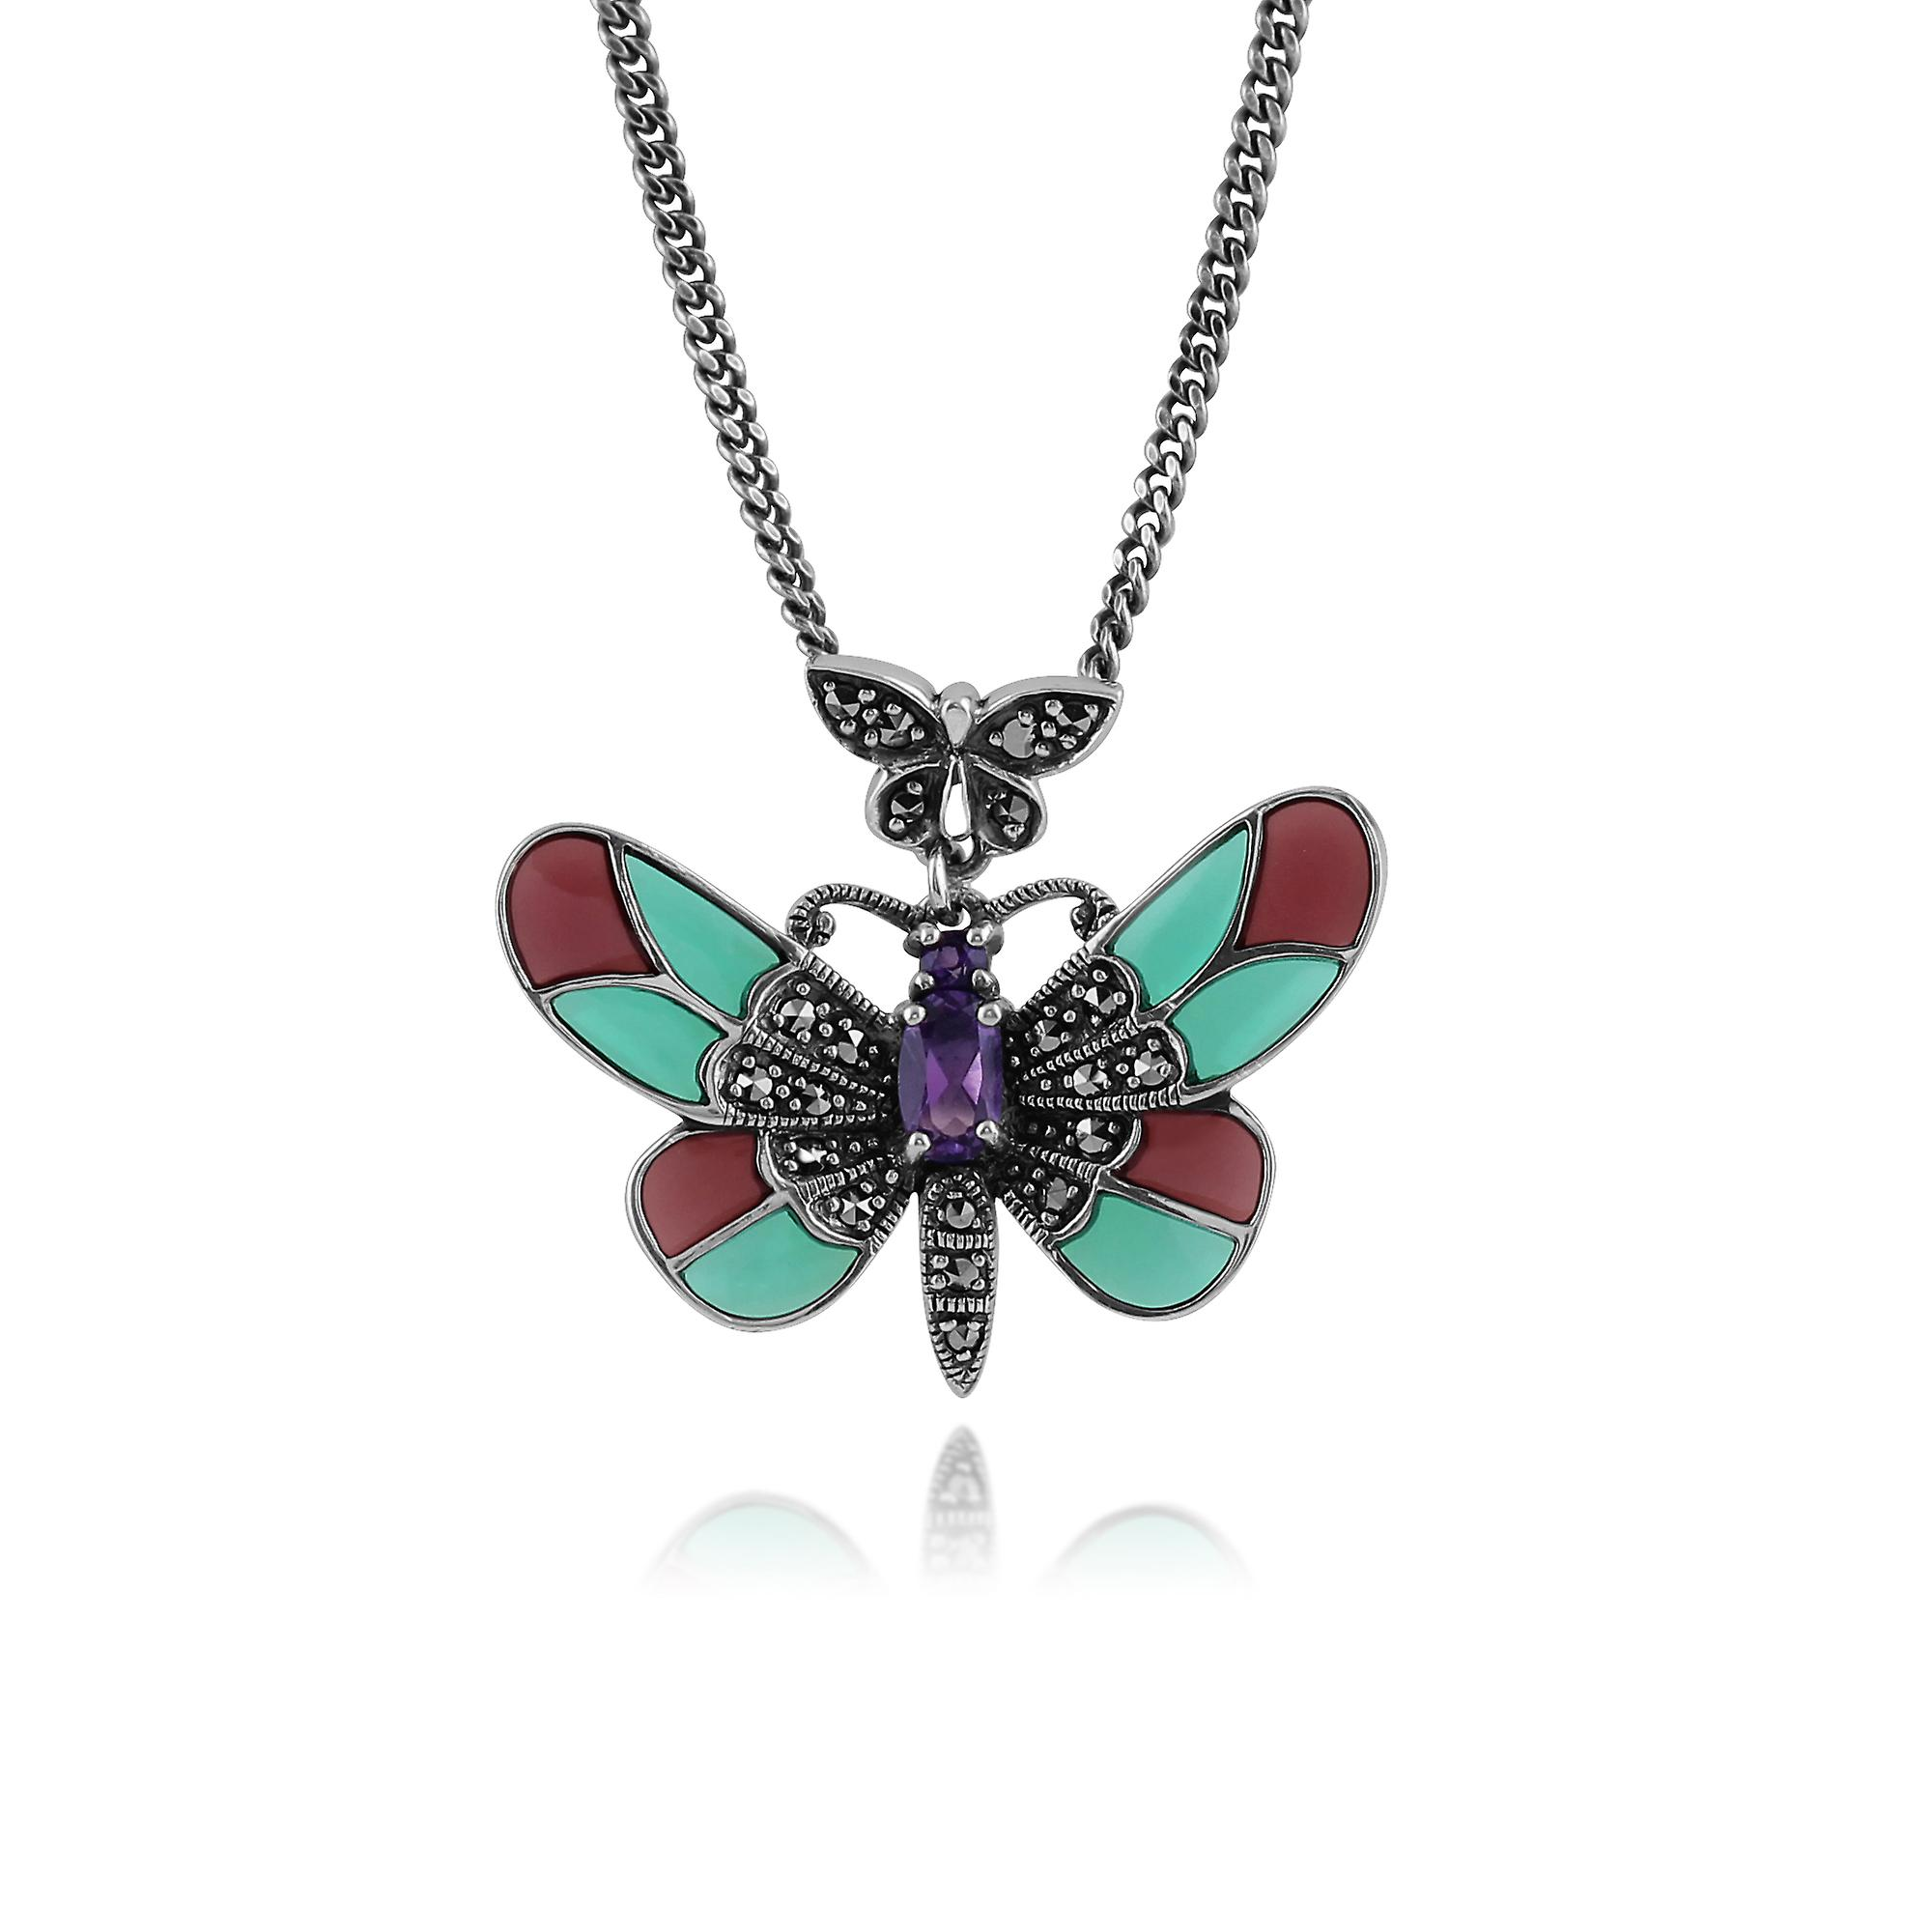 Gemondo Sterling Silver 0.25ct Amethyst, Marcasite & Enamel Butterfly Necklace